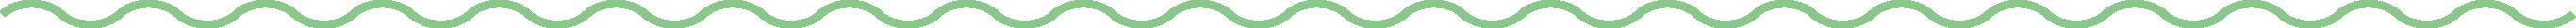 green-wiggle-line